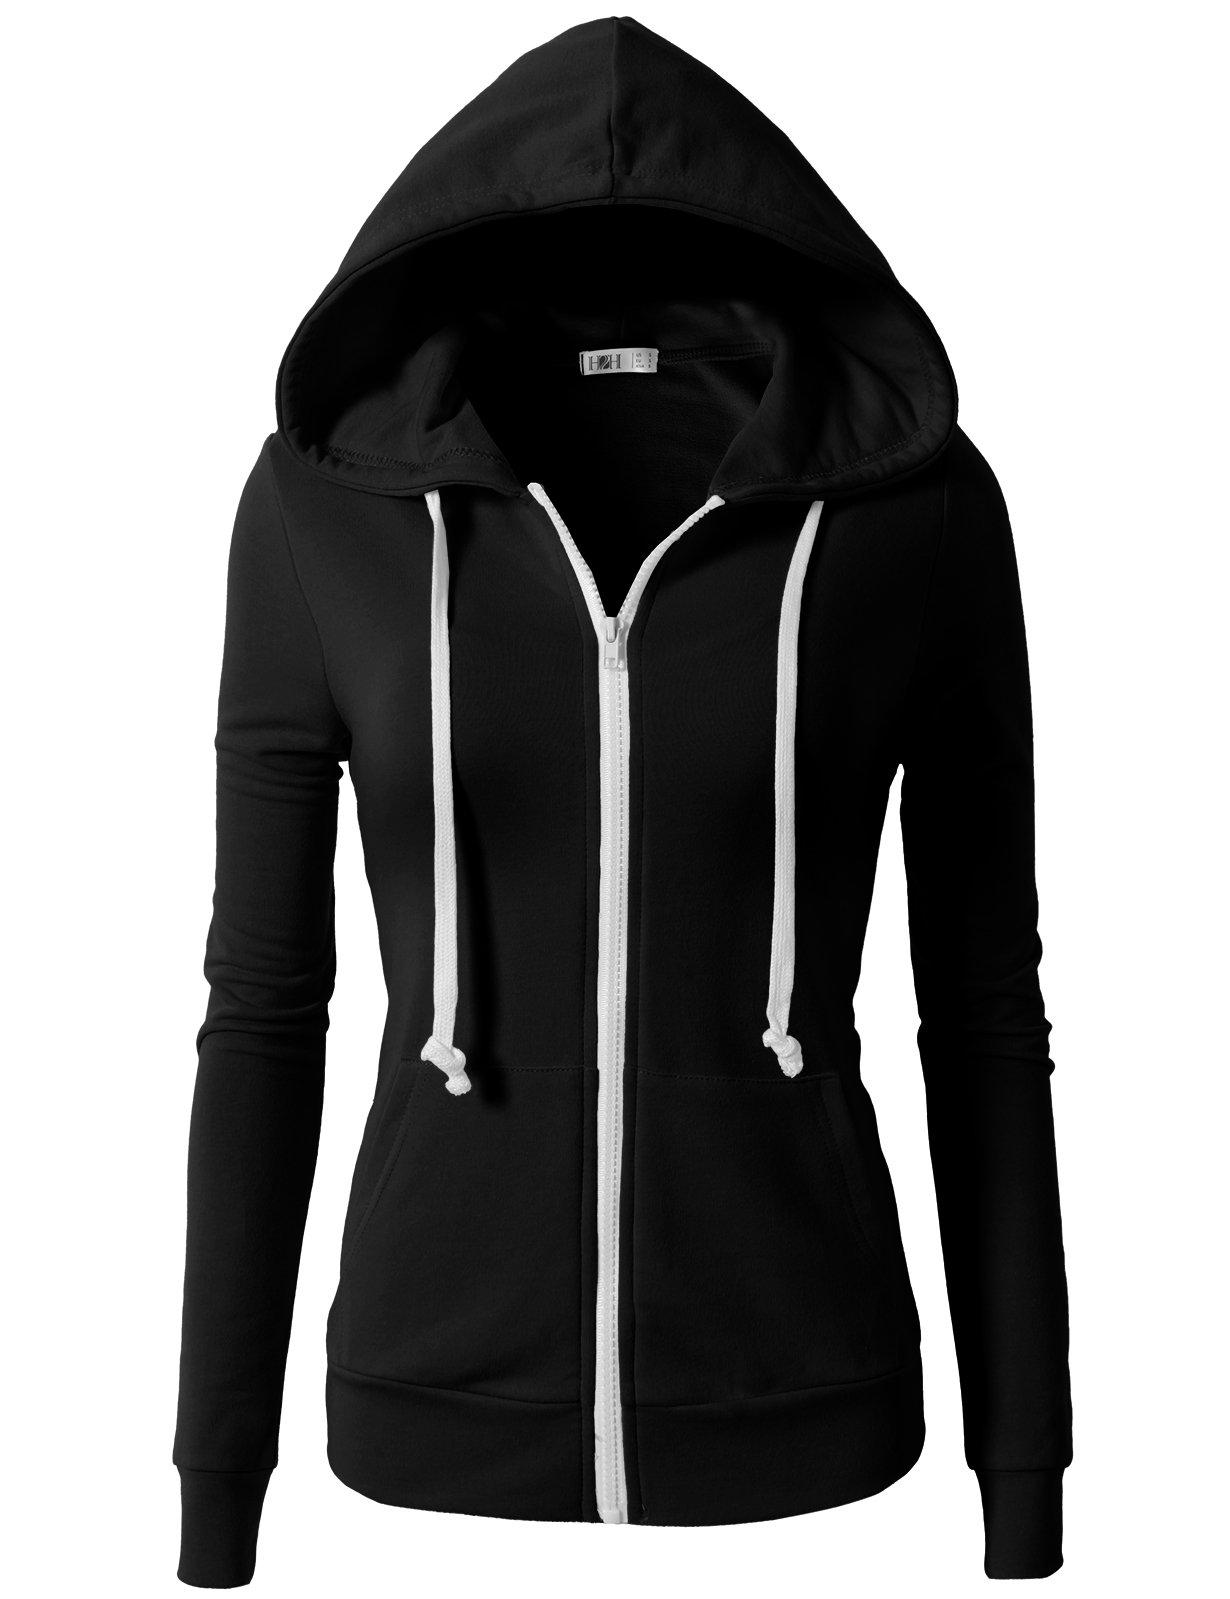 H2H Womens Comfortable Long Sleeve Zipper Kangaroo Pocket Hoodie Jackets Black US M/Asia M (CWOHOL020)